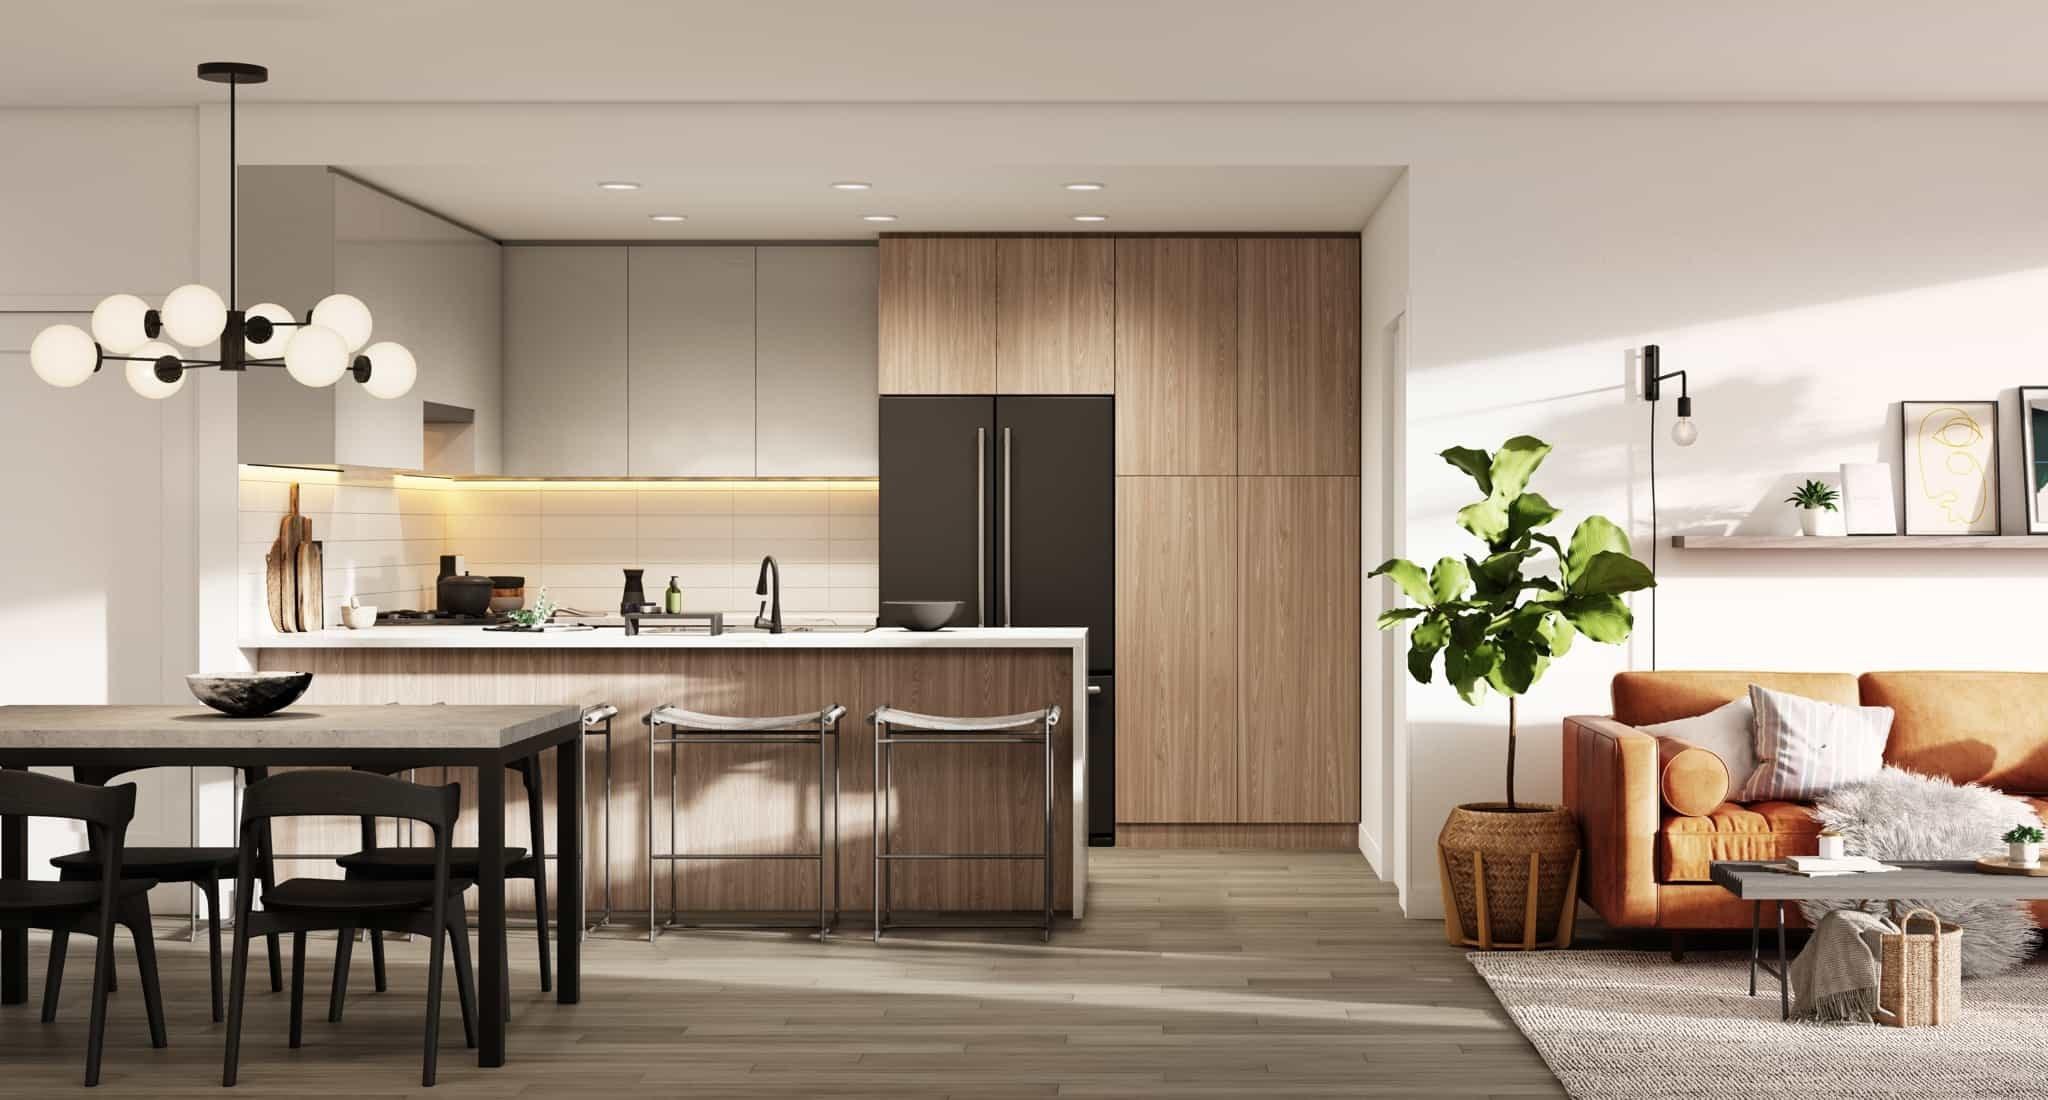 Dining, Kitchen, and Living Area - 2408 Grant St, Vancouver, BC V0V 0V0, Canada!